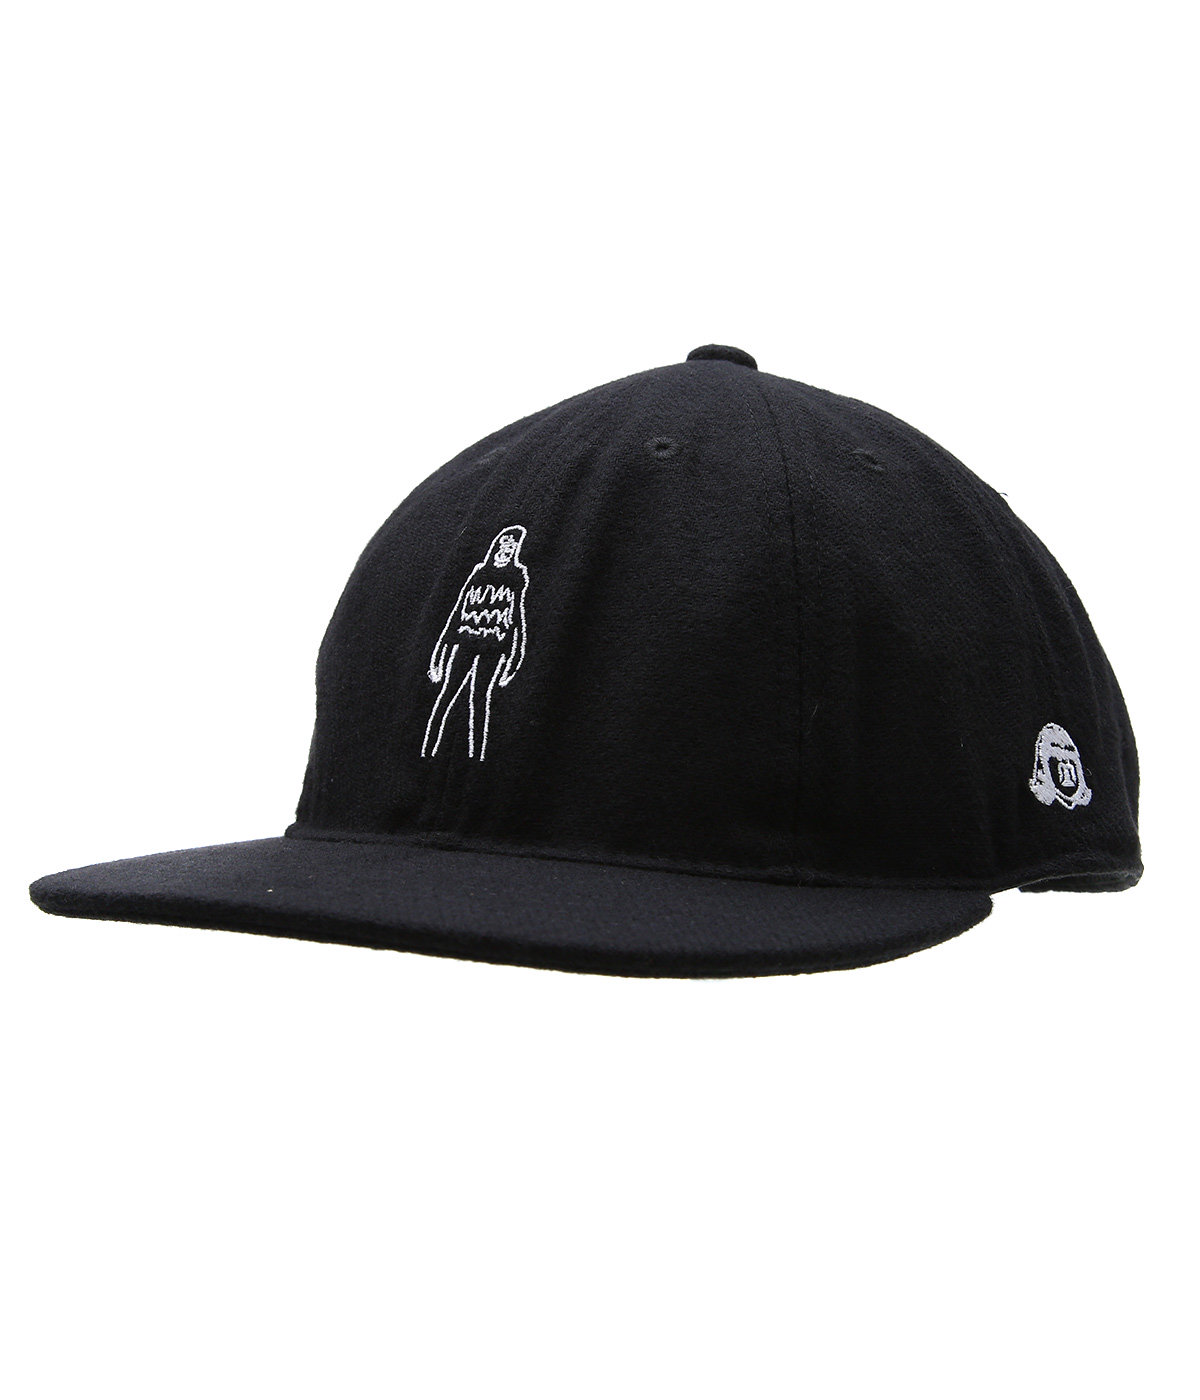 BACOA CAP